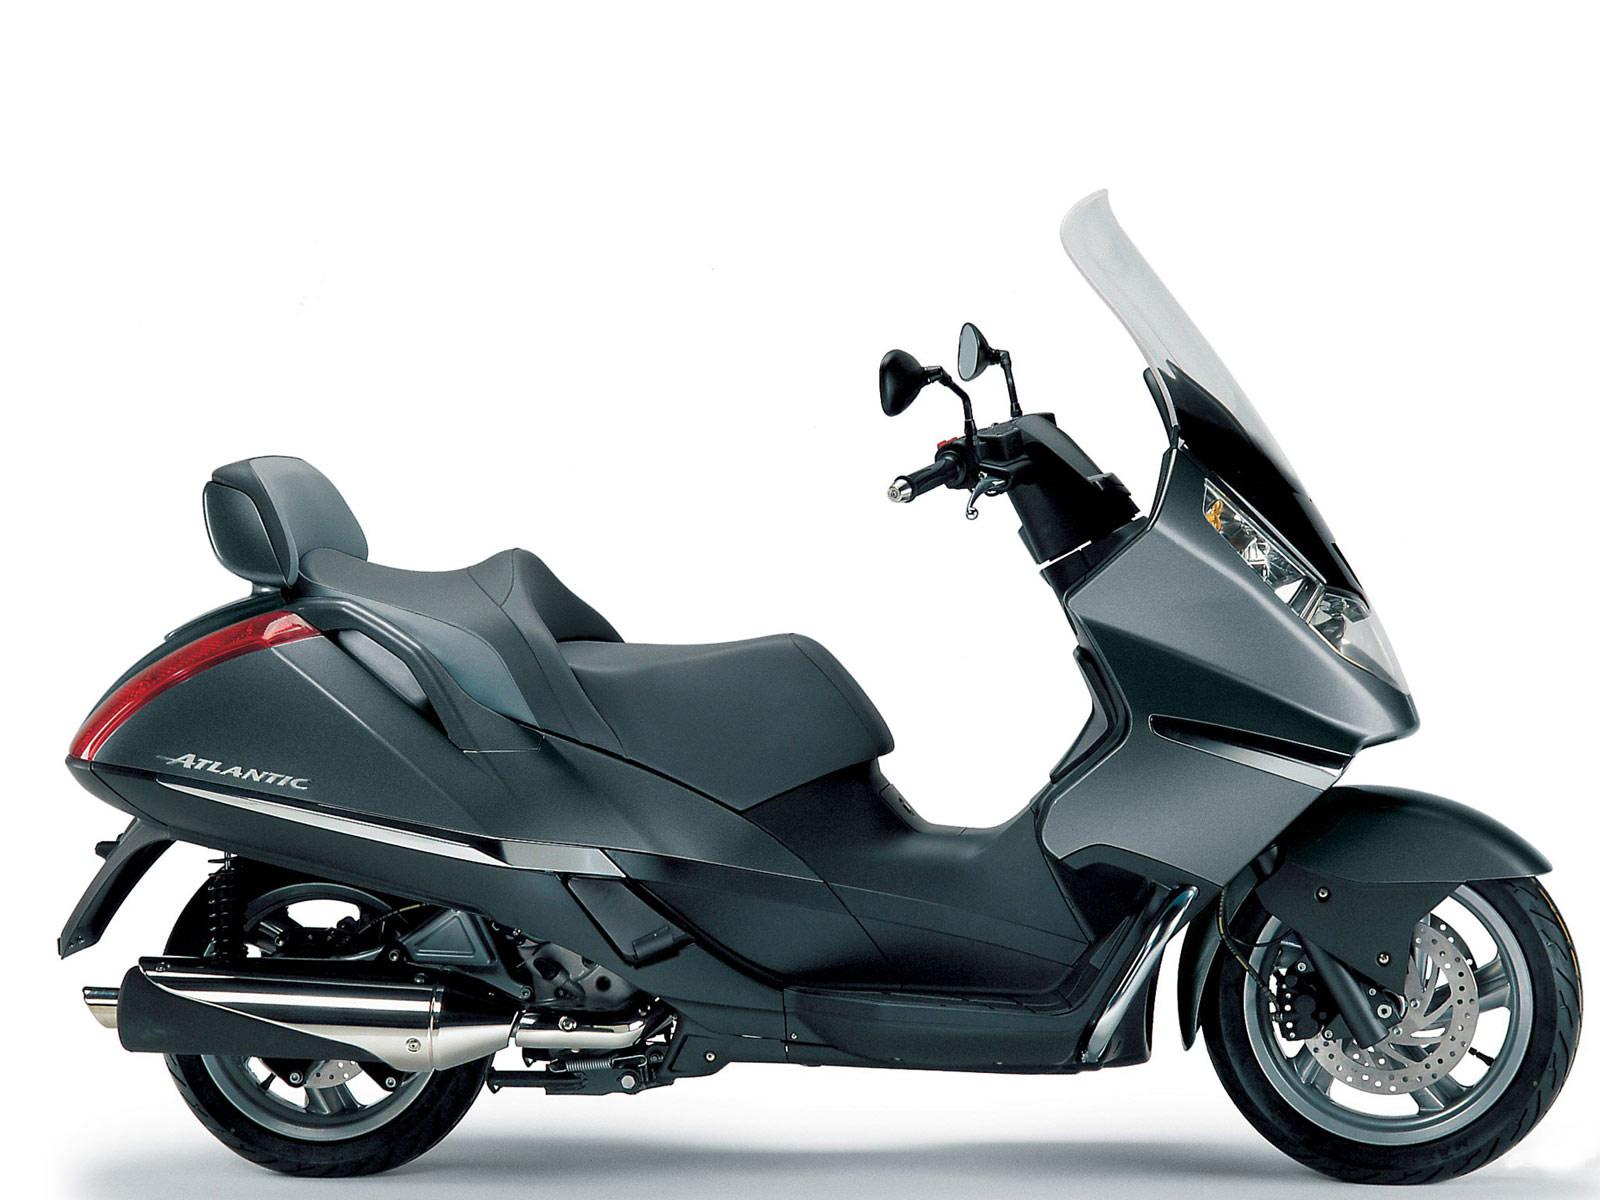 2005 aprilia atlantic 500 scooter pictures accident lawyers info. Black Bedroom Furniture Sets. Home Design Ideas